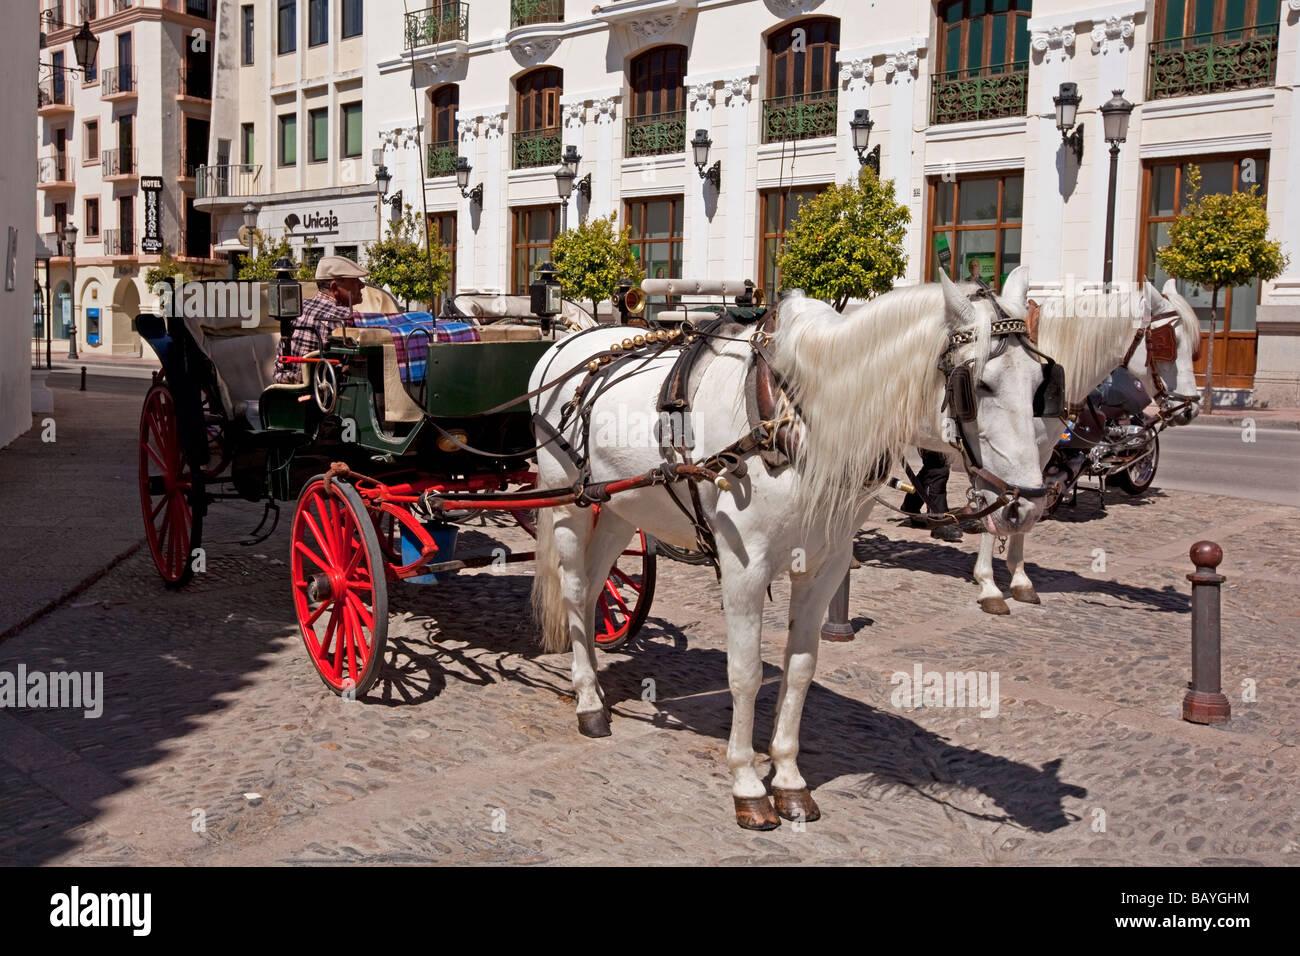 Horse and wagon Ronda, Spain - Stock Image